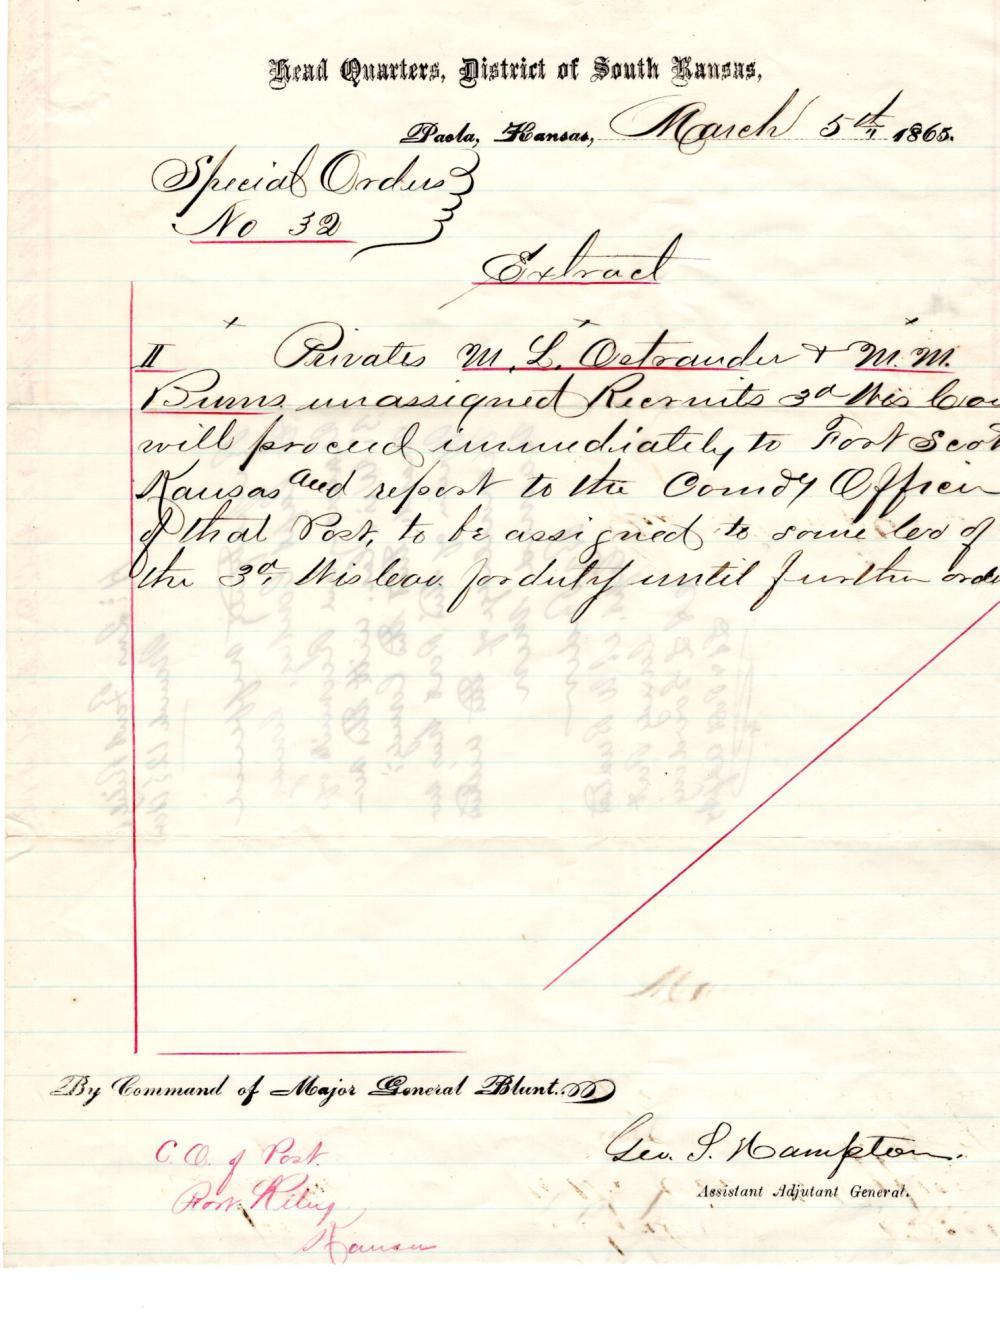 Fort Scott Civil War orders, 1865